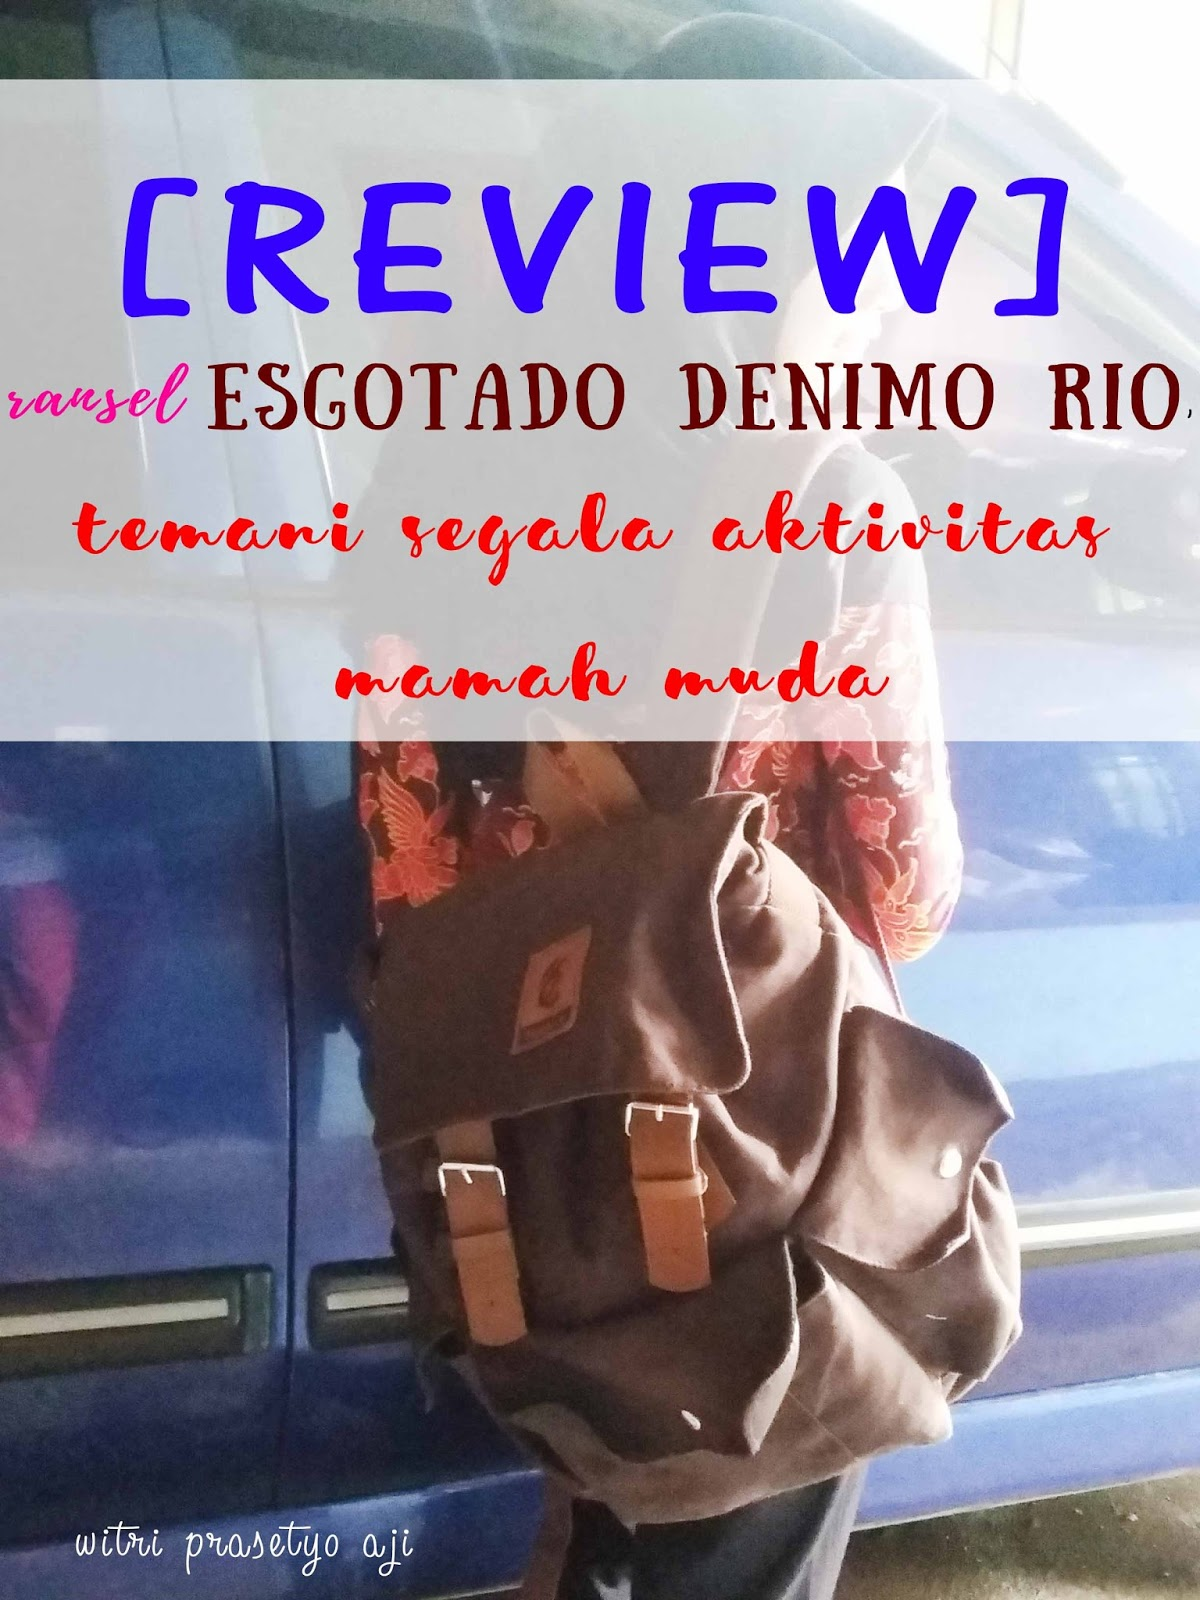 [REVIEW] RANSEL ESGOTADO DENIMO RIO, TEMANI SEGALA AKTIVITAS MAMAH MUDA